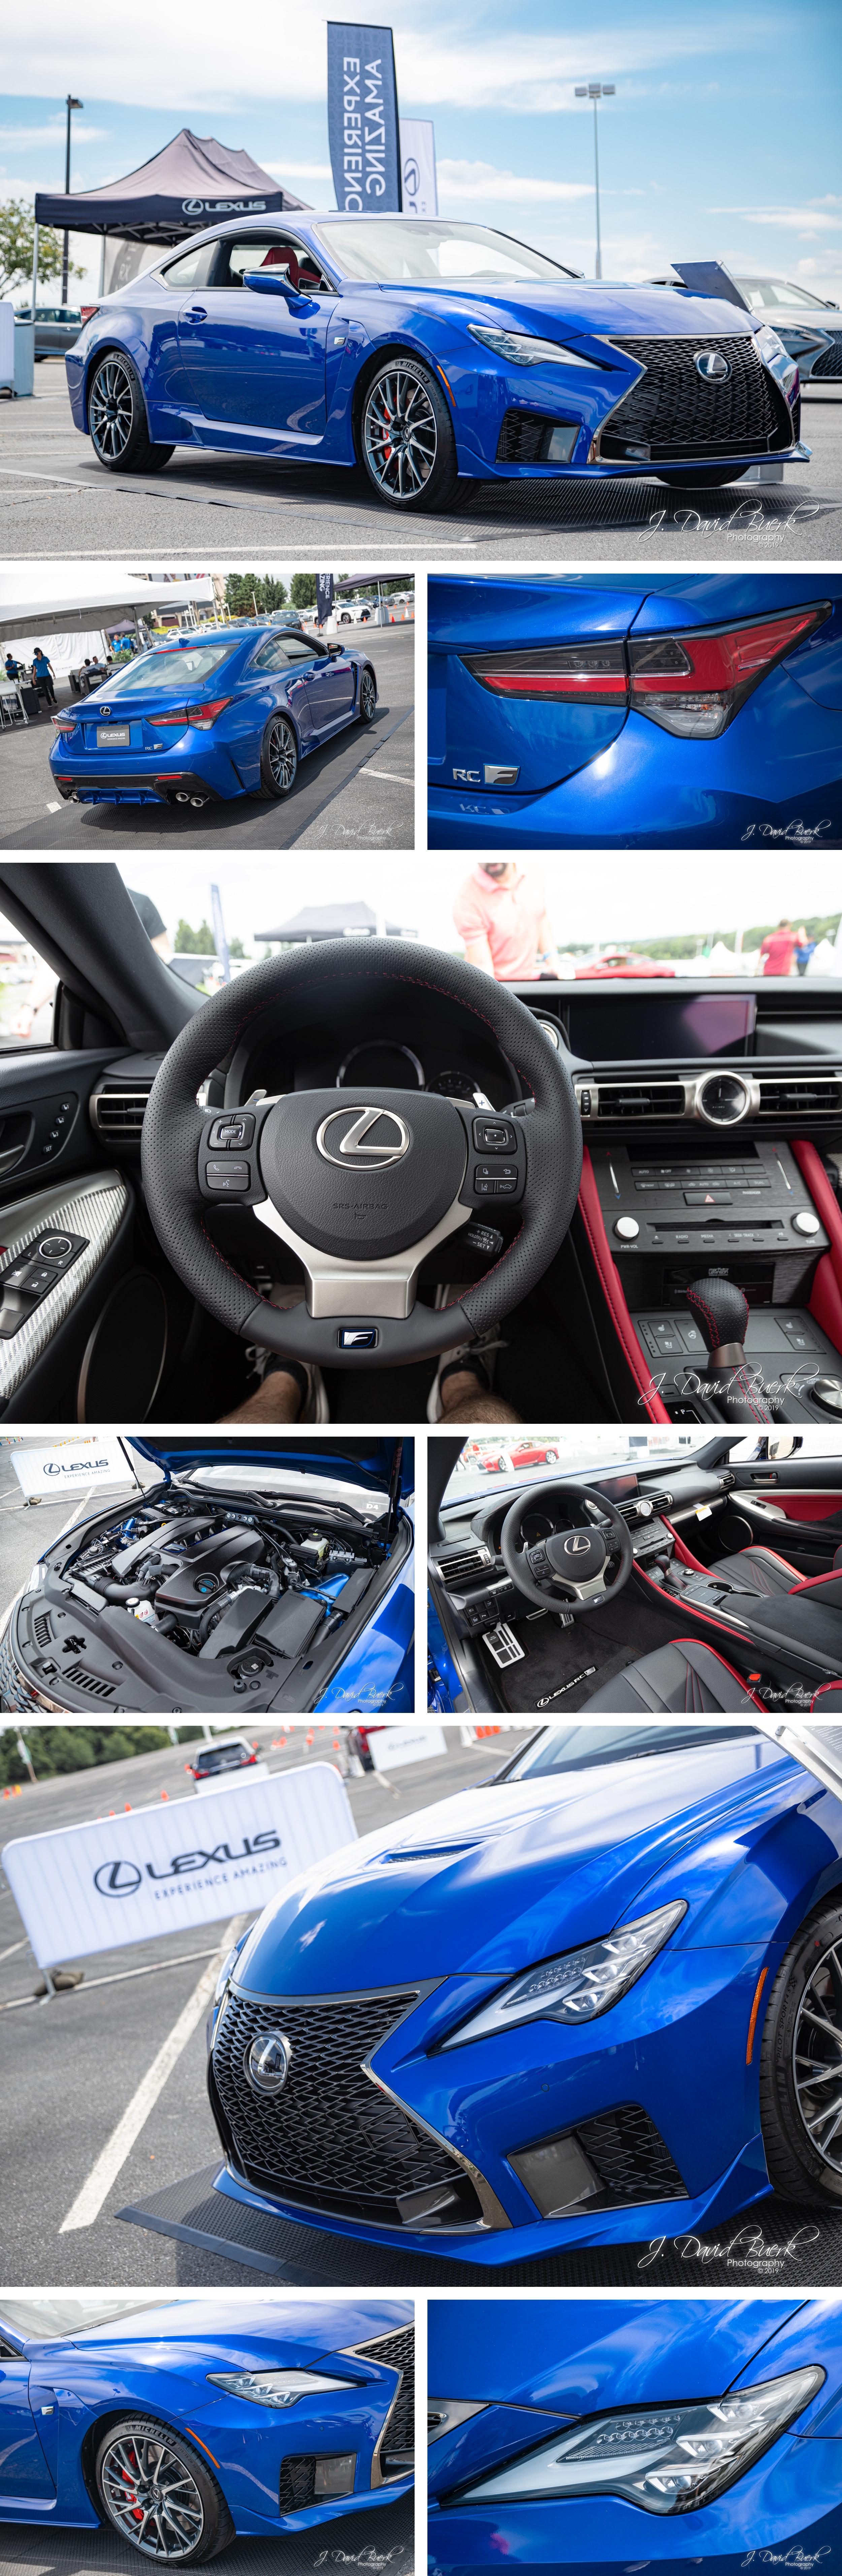 20190810 - Lexus Experience Amazing Drive Event 9.jpg